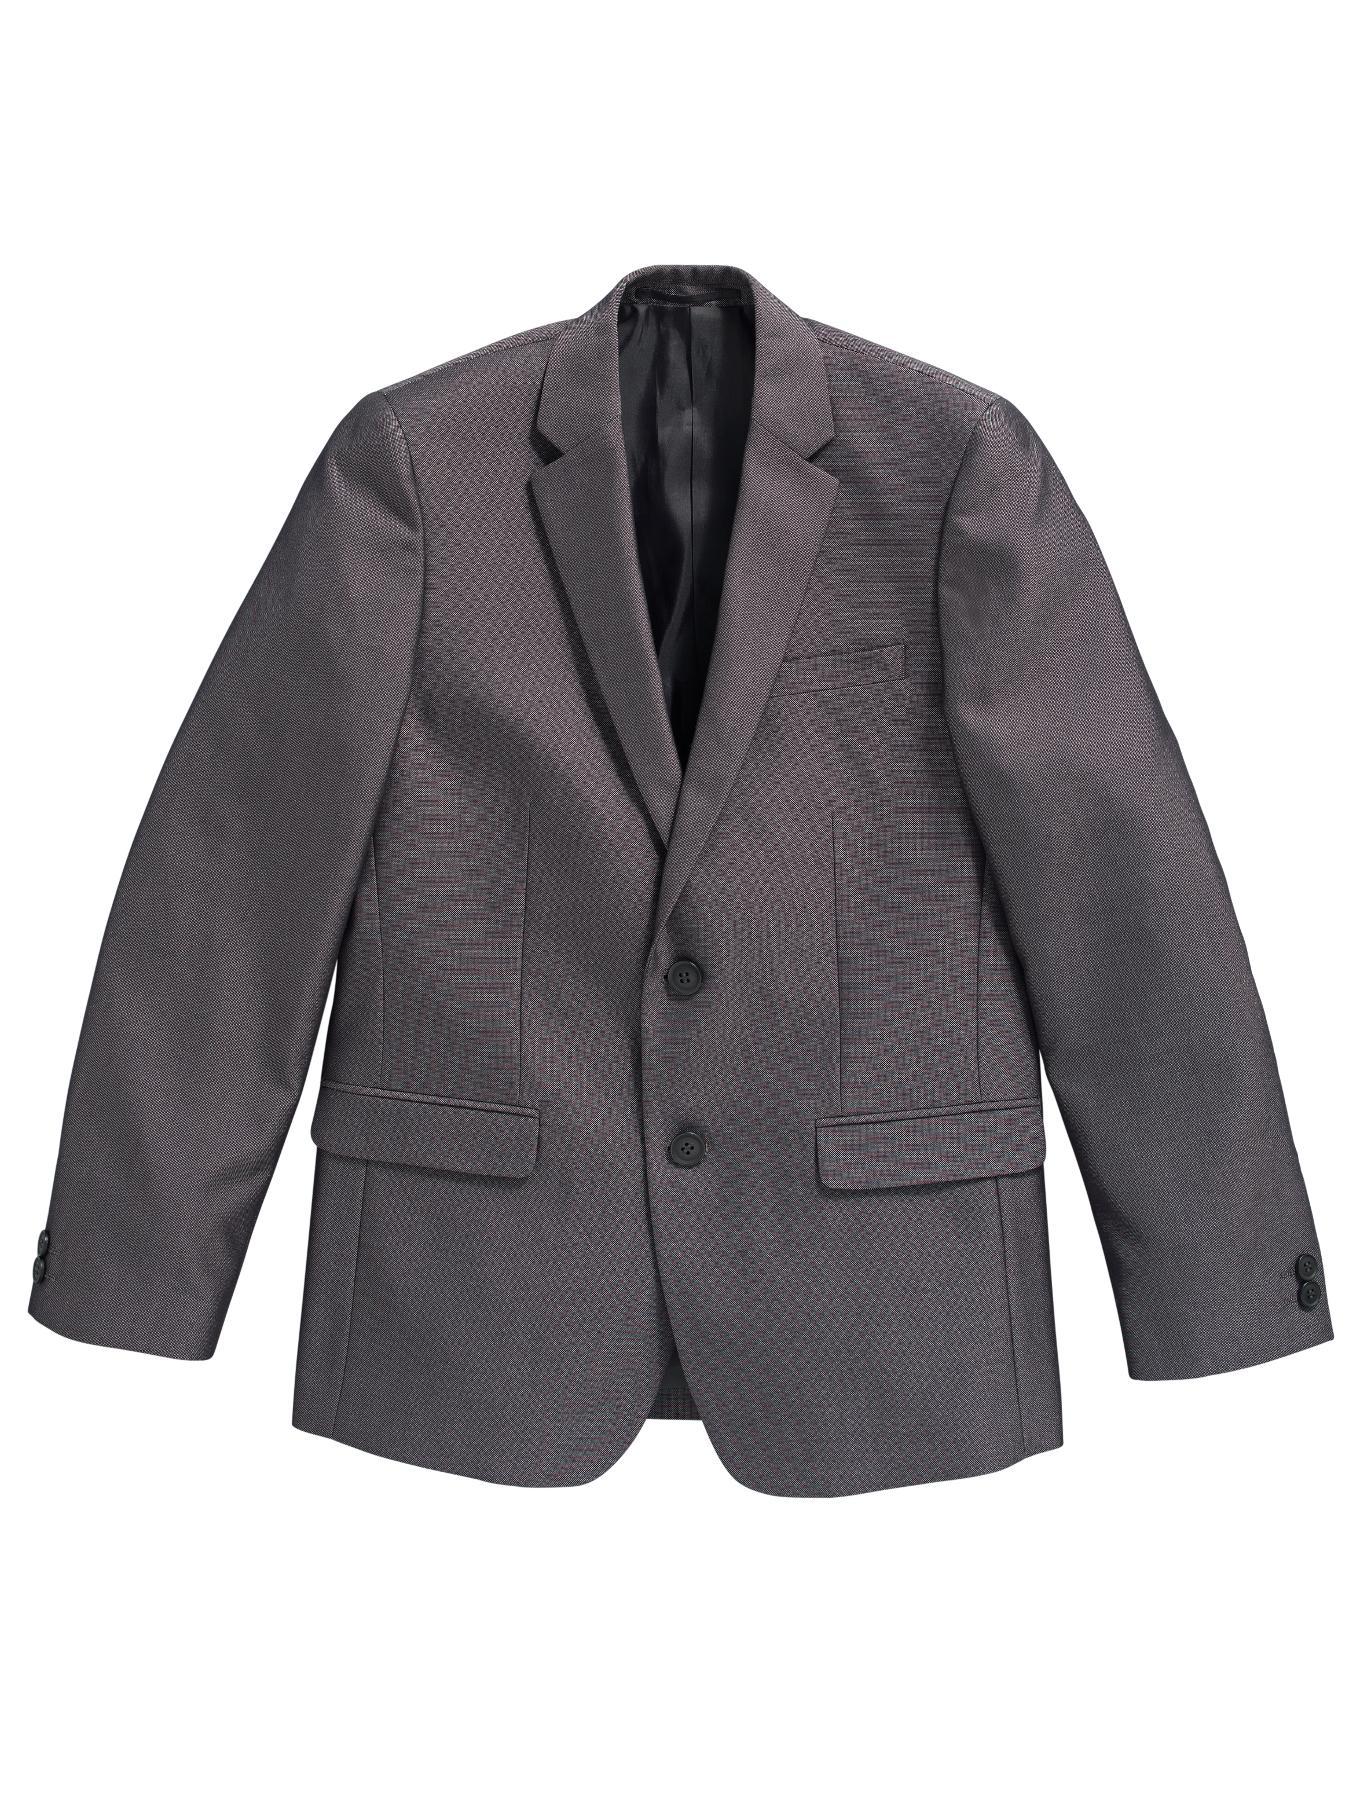 Boys Smart Blazer Suit Jacket, Navy,Black,Grey